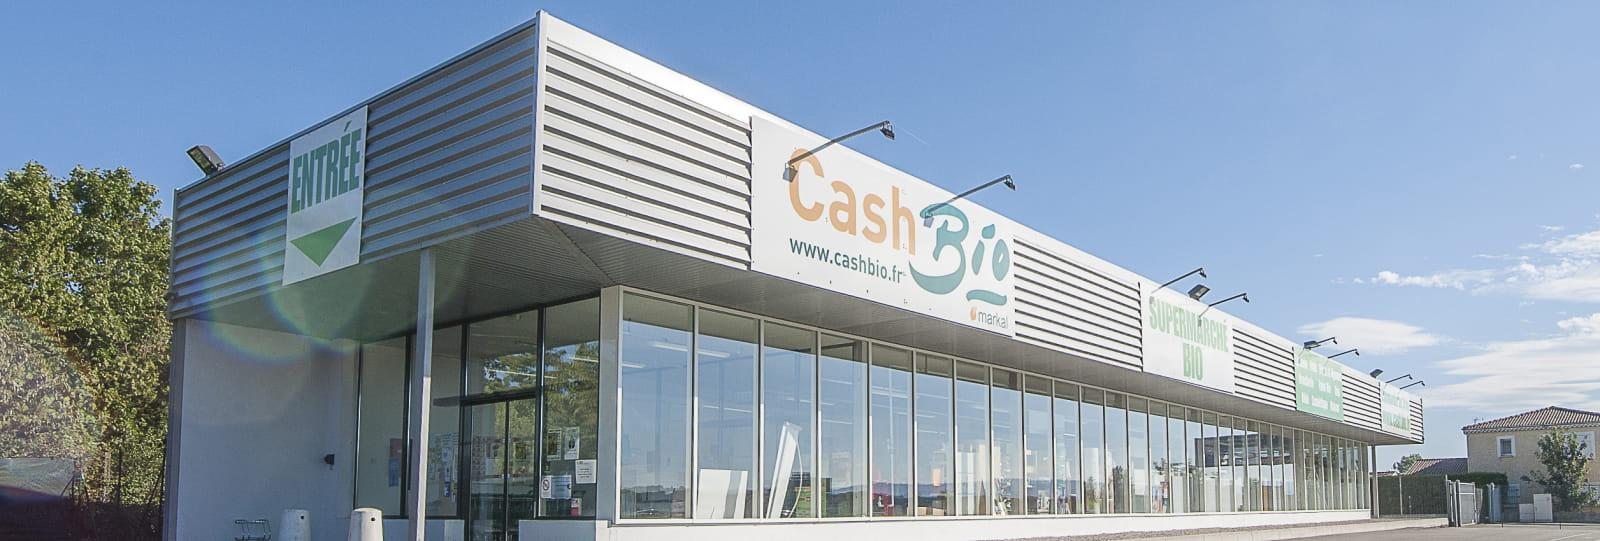 Cash Bio Markal